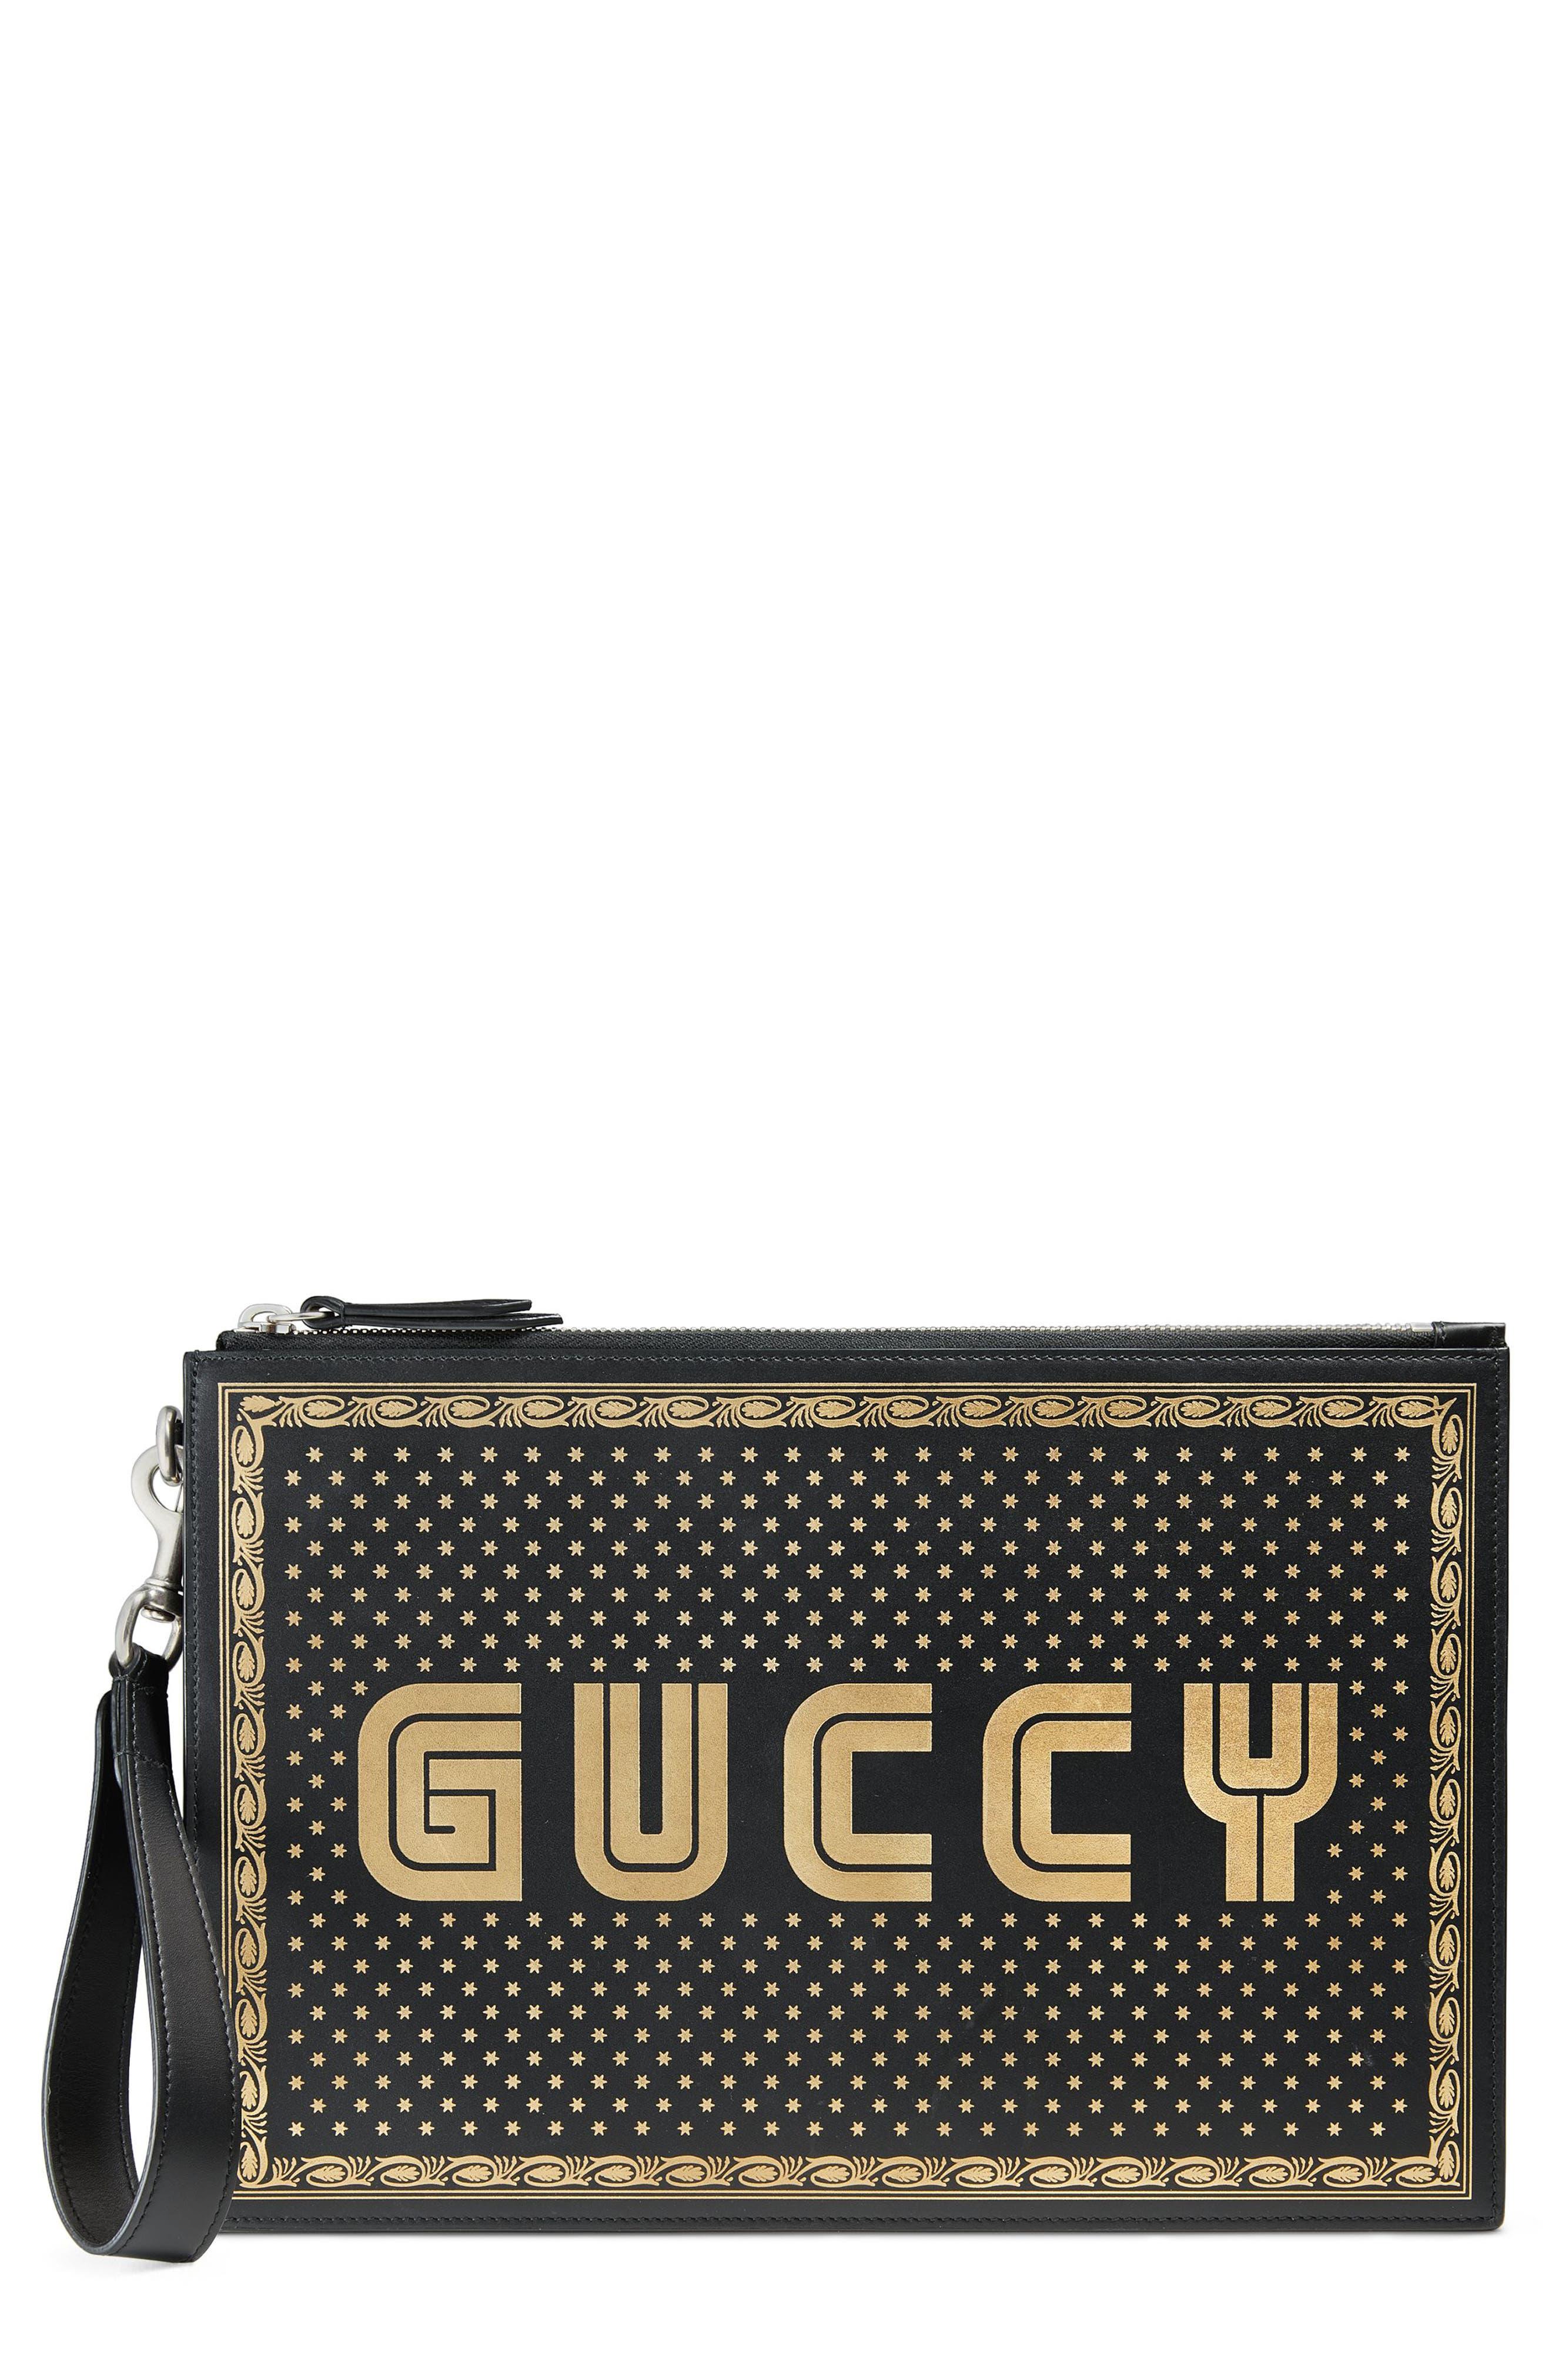 GUCCI Guccy Moon & Stars Leather Zip Pouch, Main, color, NERO/ ORO